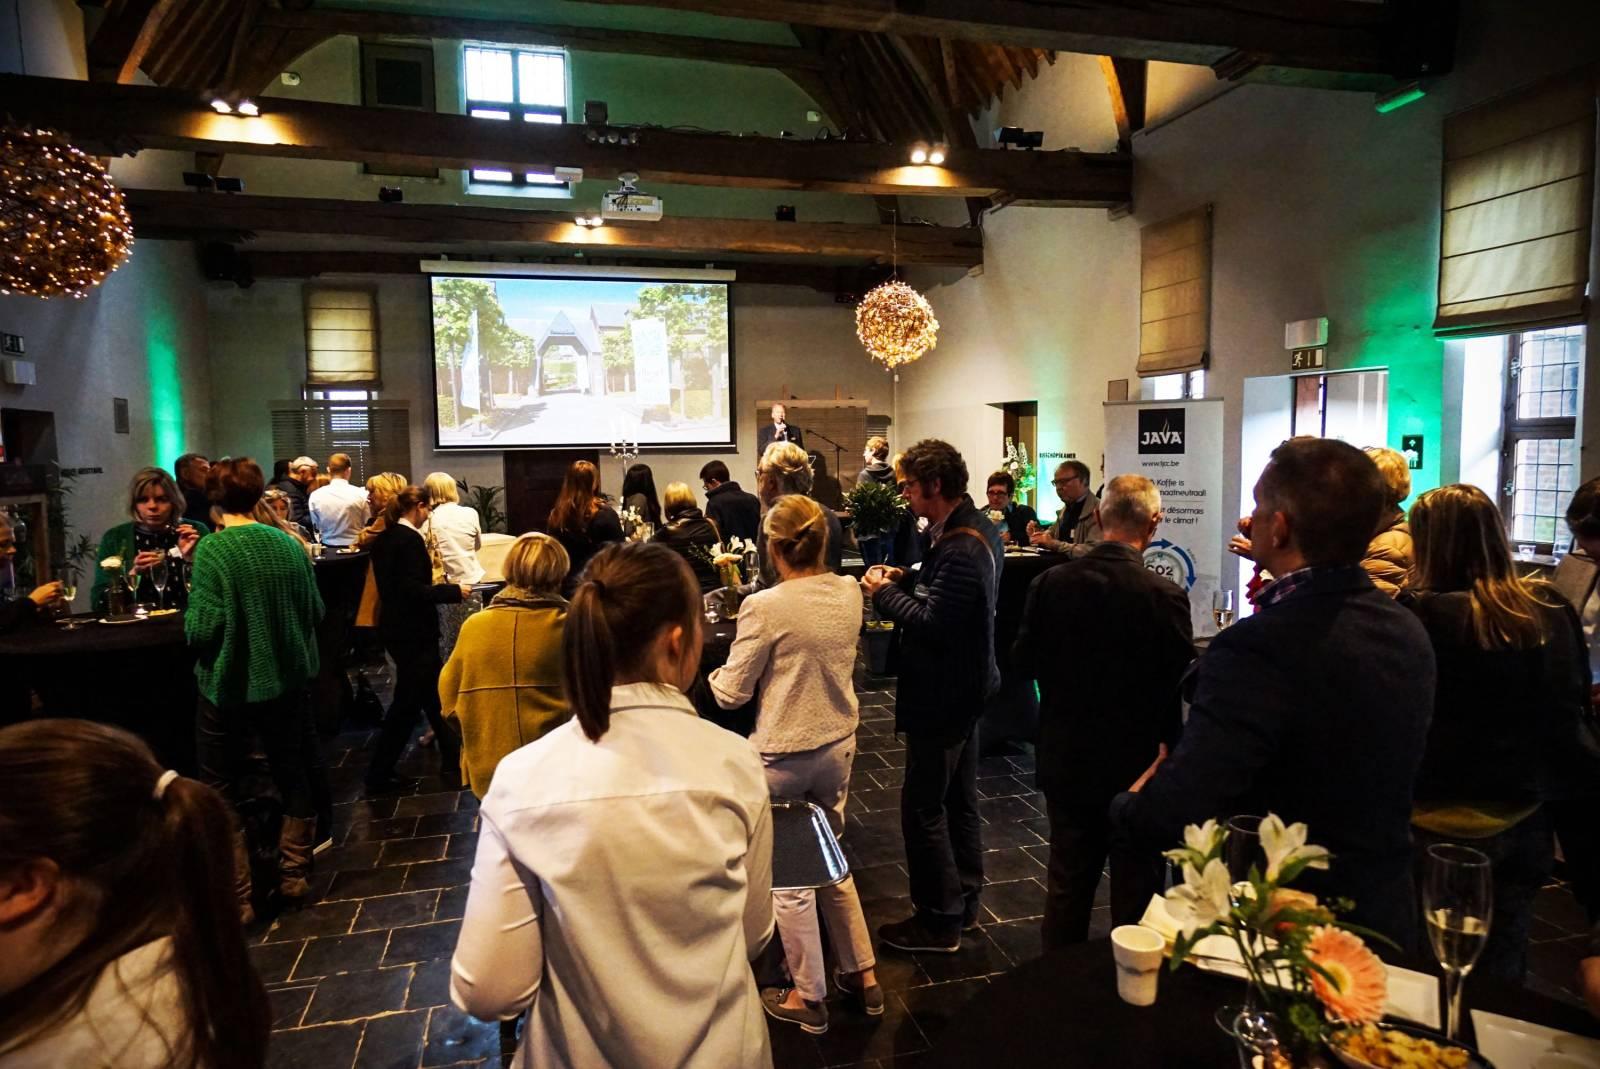 Faculty Club - Feestzaal te Leuven - Eventlocatie - GARDEN LOUNGE MEI 2019 - House of Events - 7